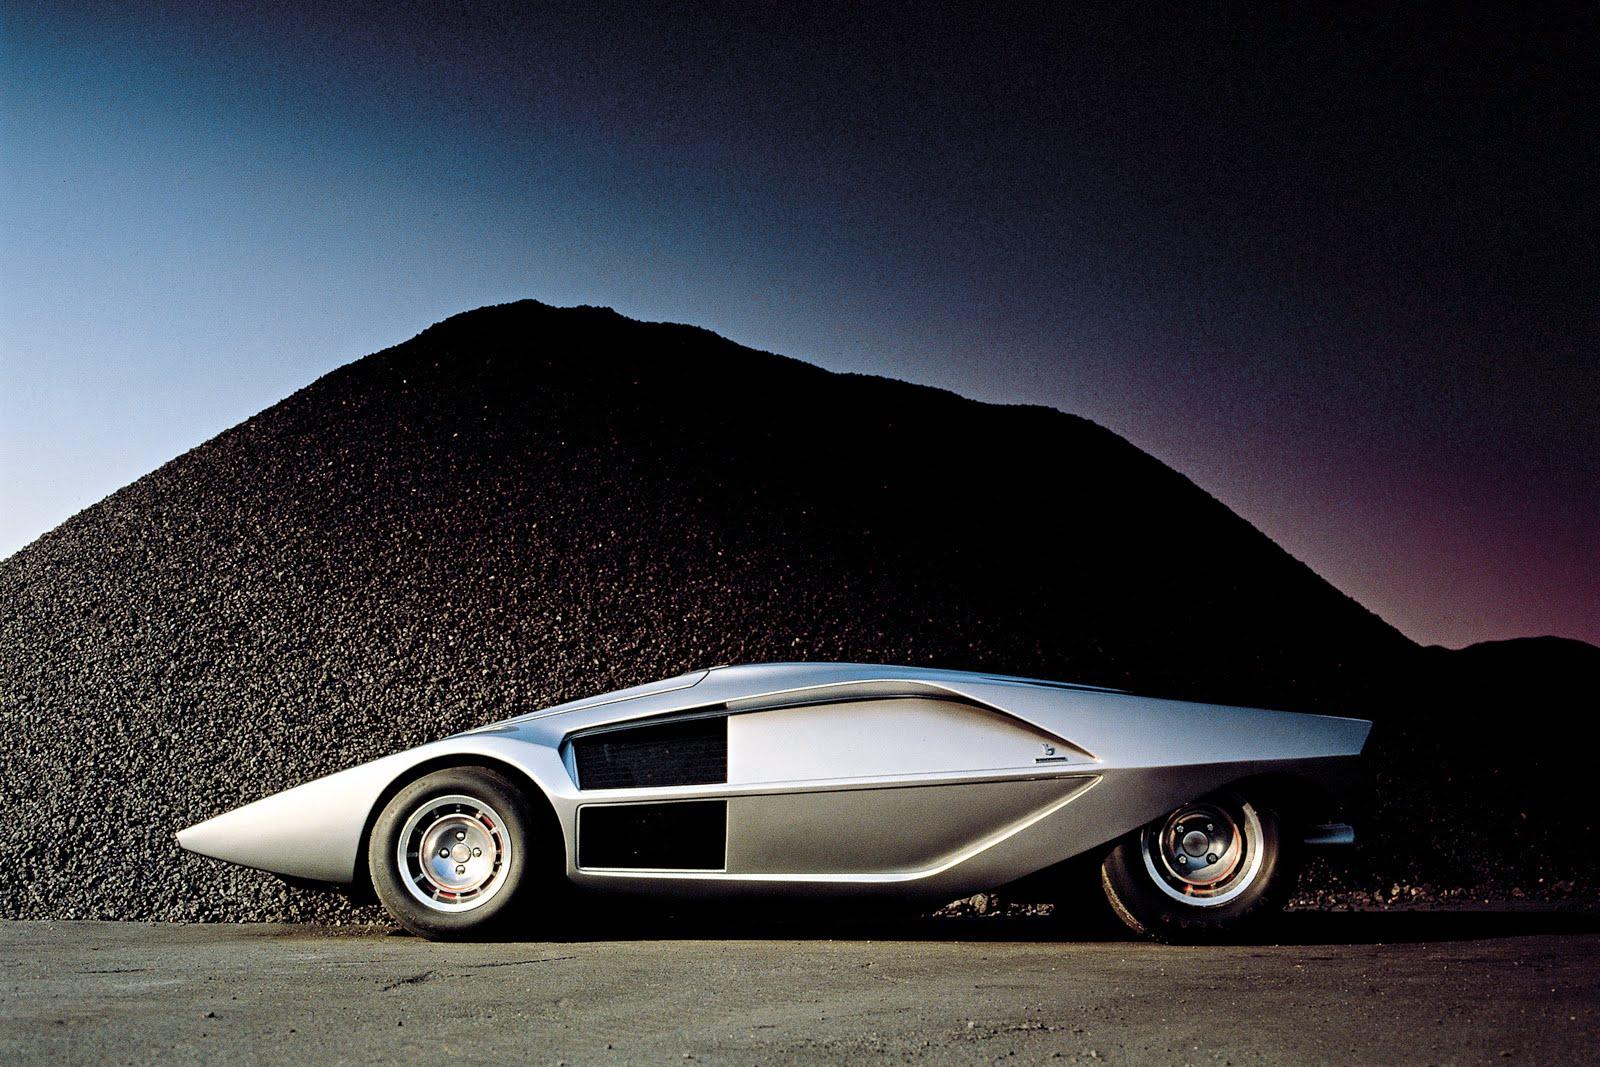 Lancia Stratos HF Zero - Breakfast in America